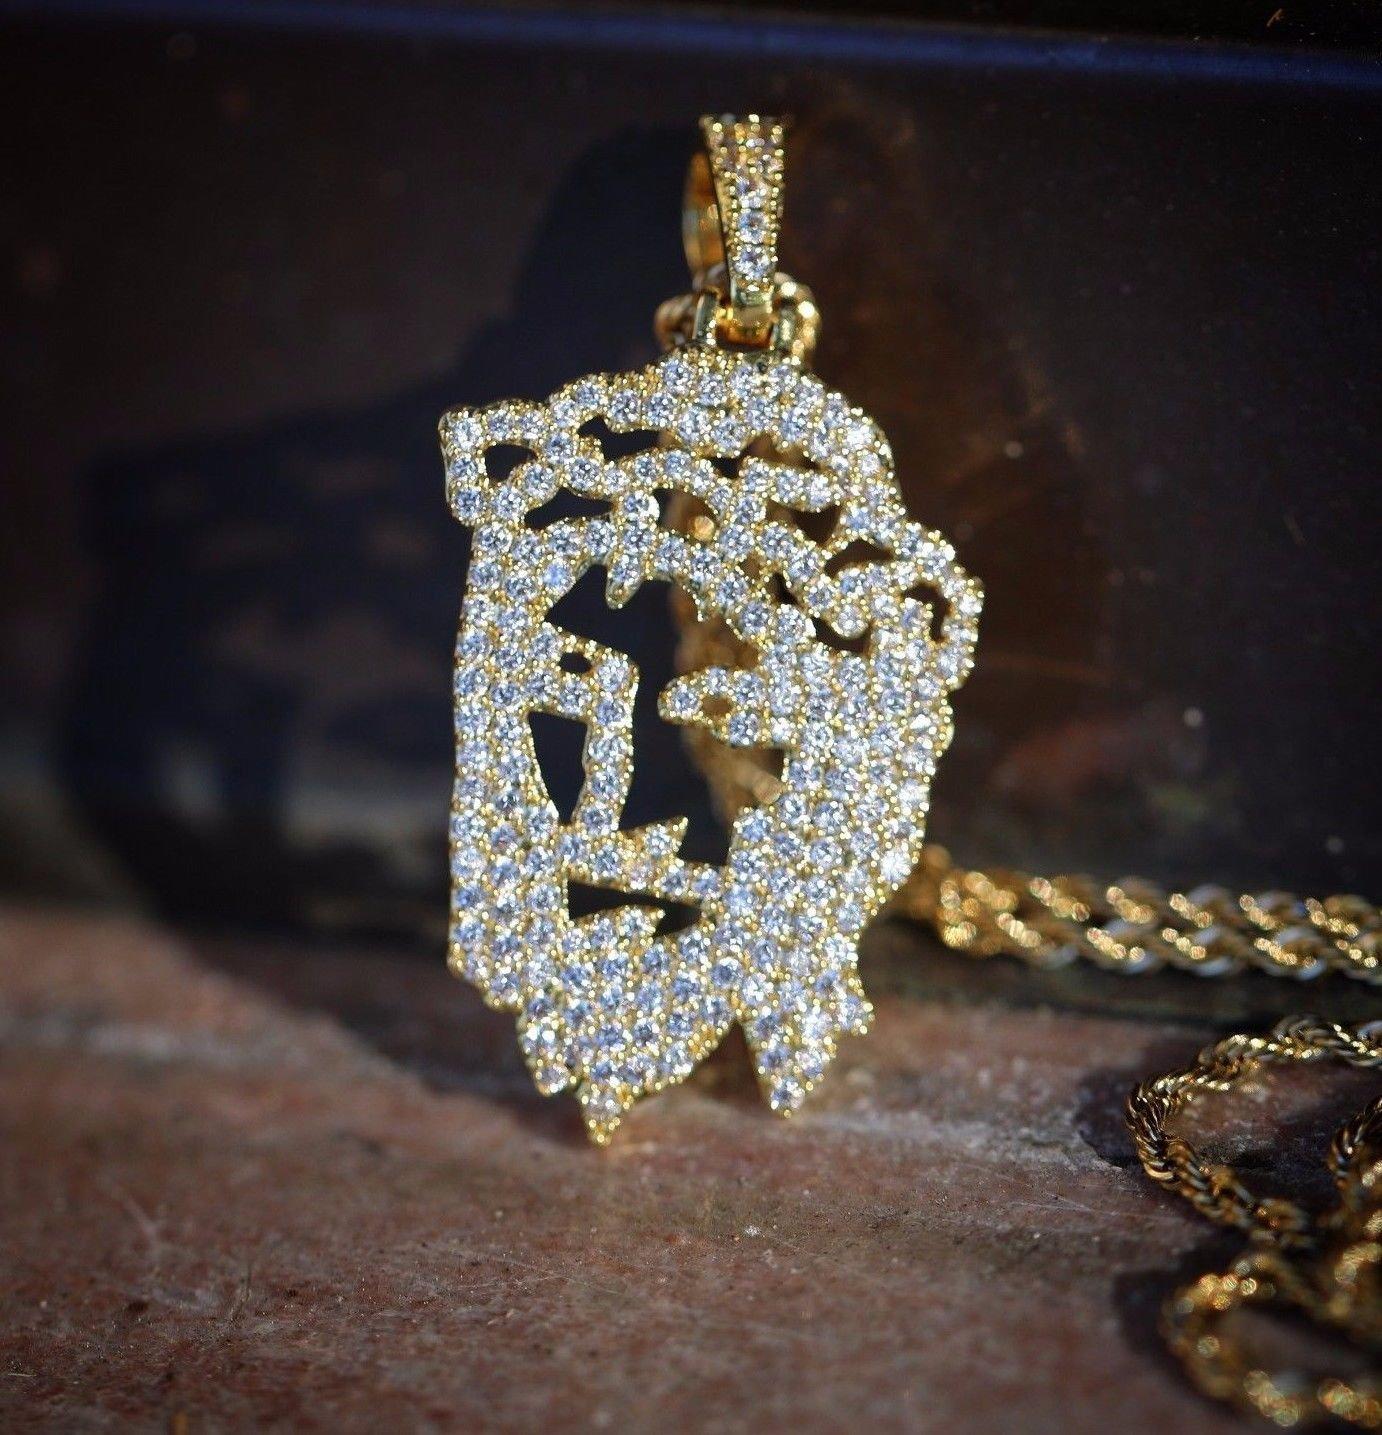 Men's 14k Gold Jesus Face Piece Pendant And Rope Chain Necklace Set